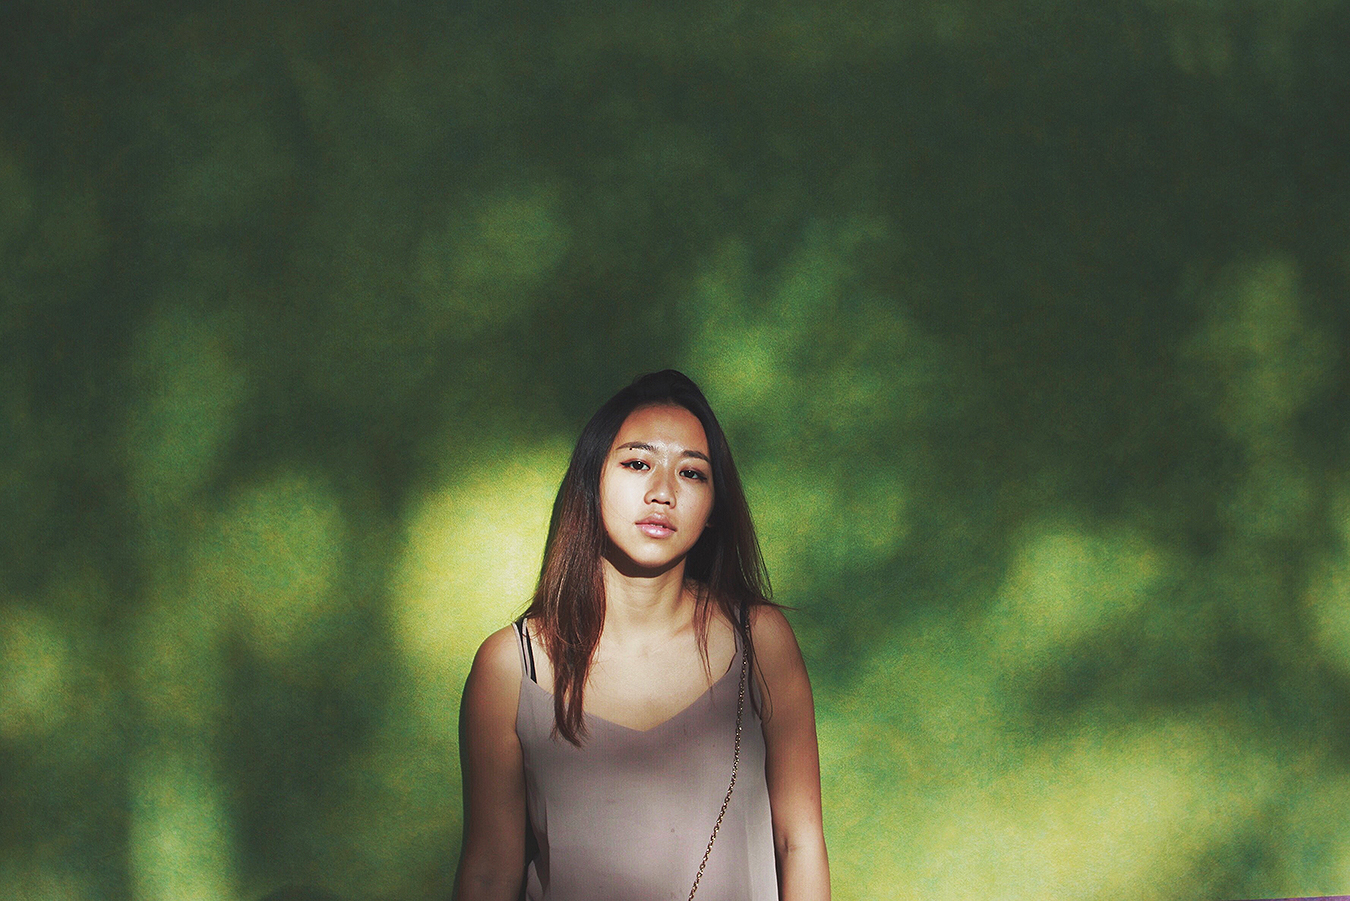 Gening_Amber_Shi_Tony_Ward_Studio_fashion_photography_class_self_portrait